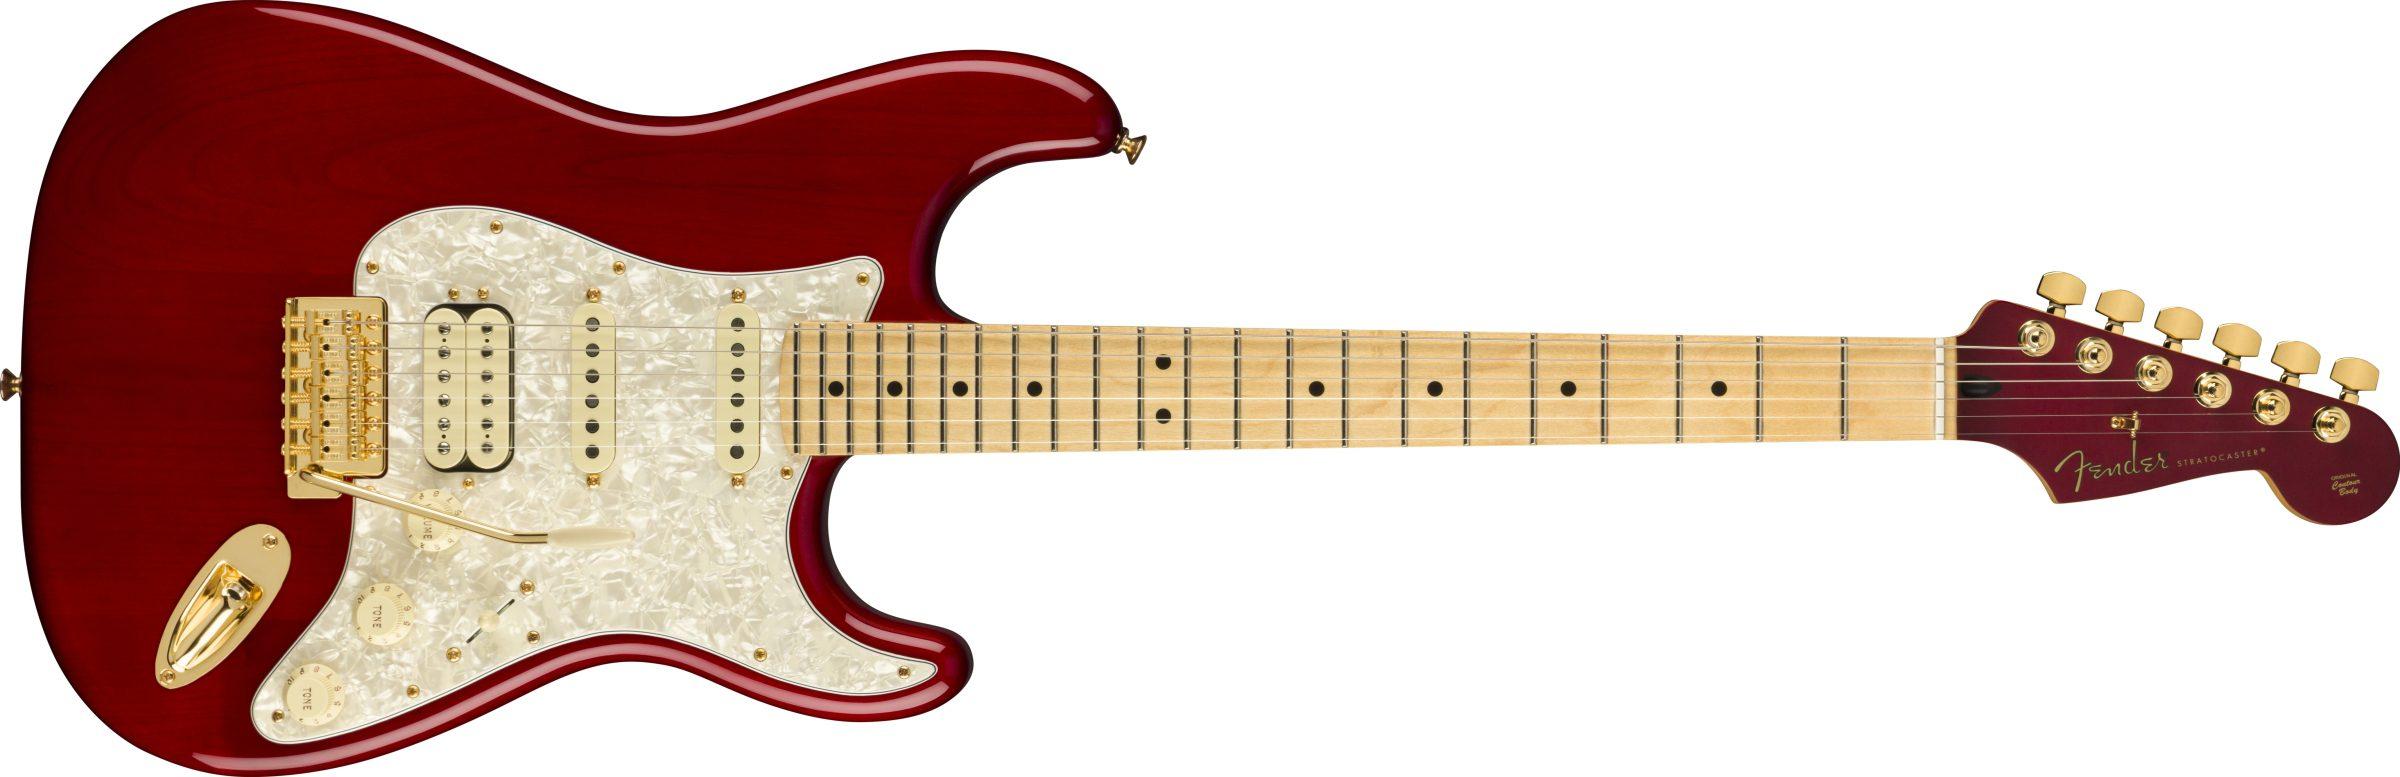 Fender Tash Sultana HSS Stratocaster Signature Front